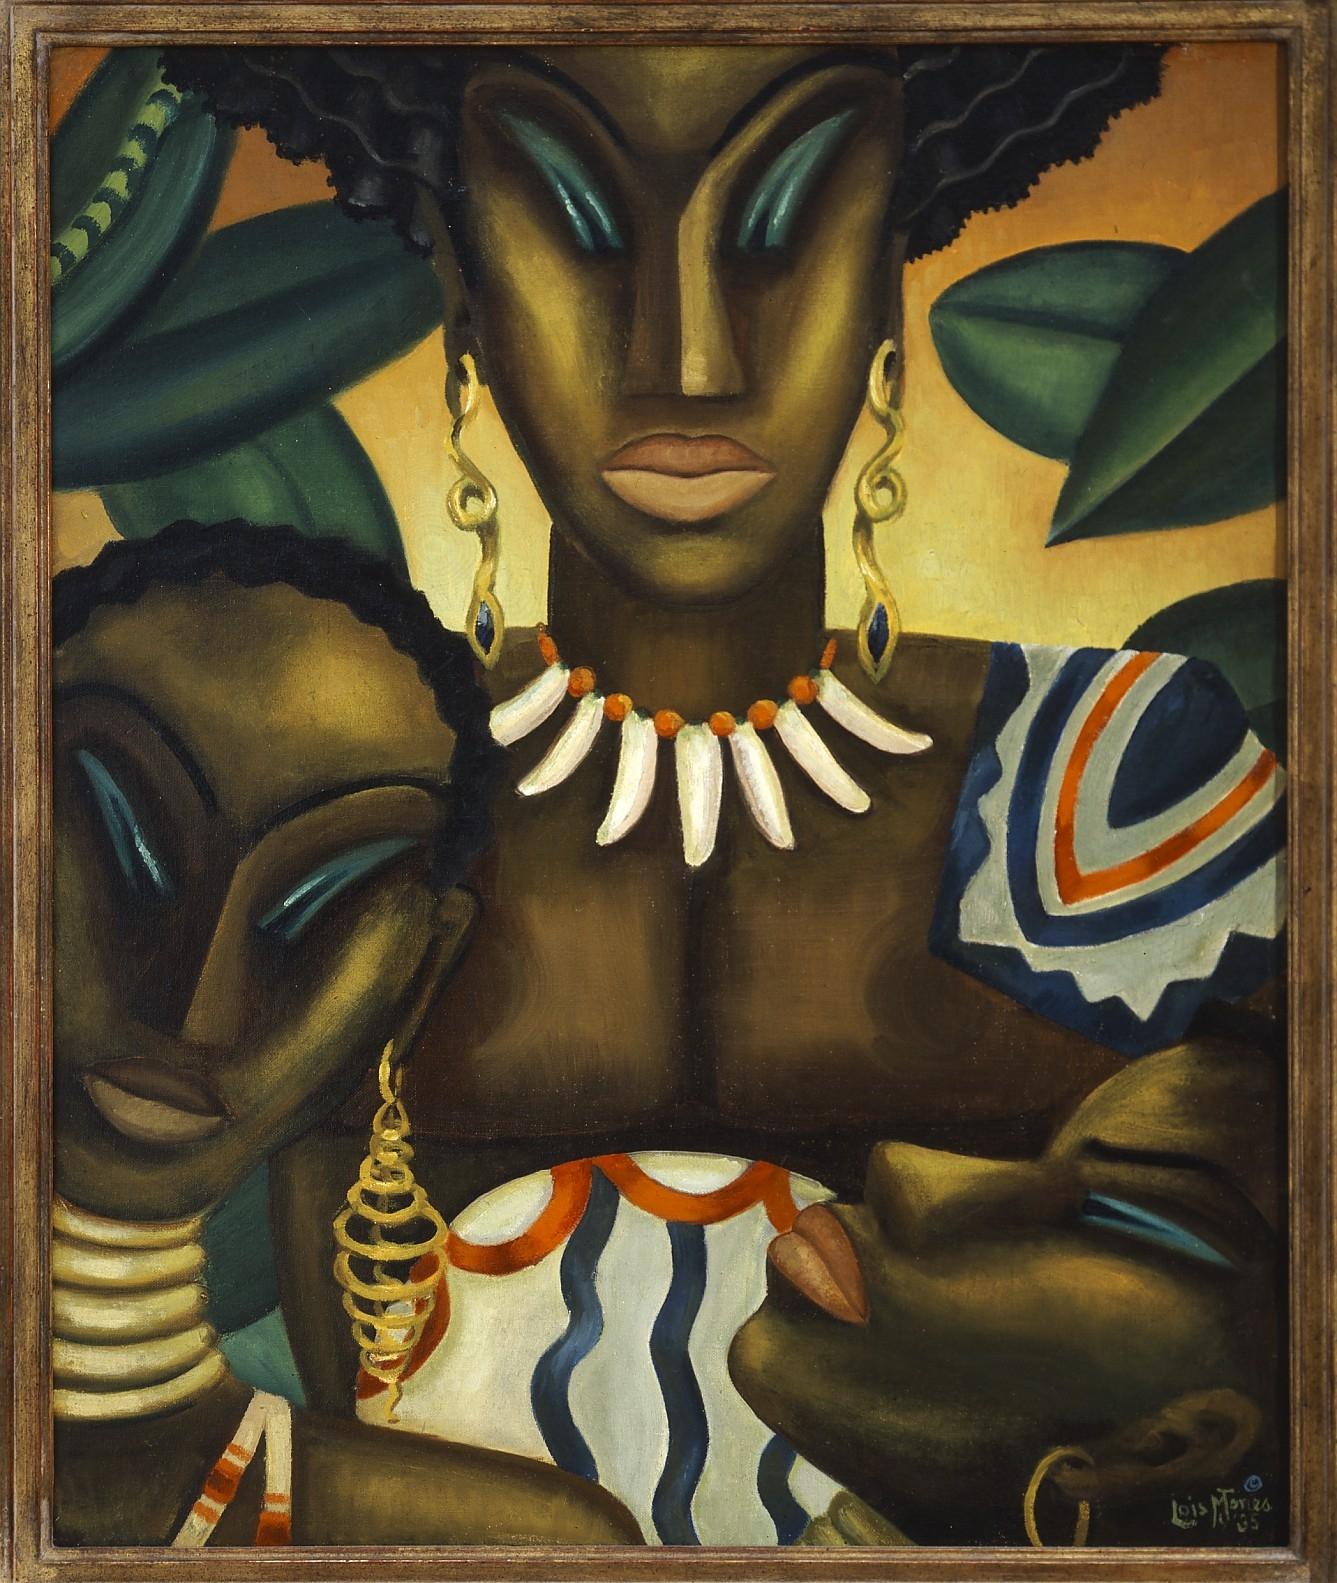 Celebrating Black History Month: Lois Mailou Jones | Broad ...